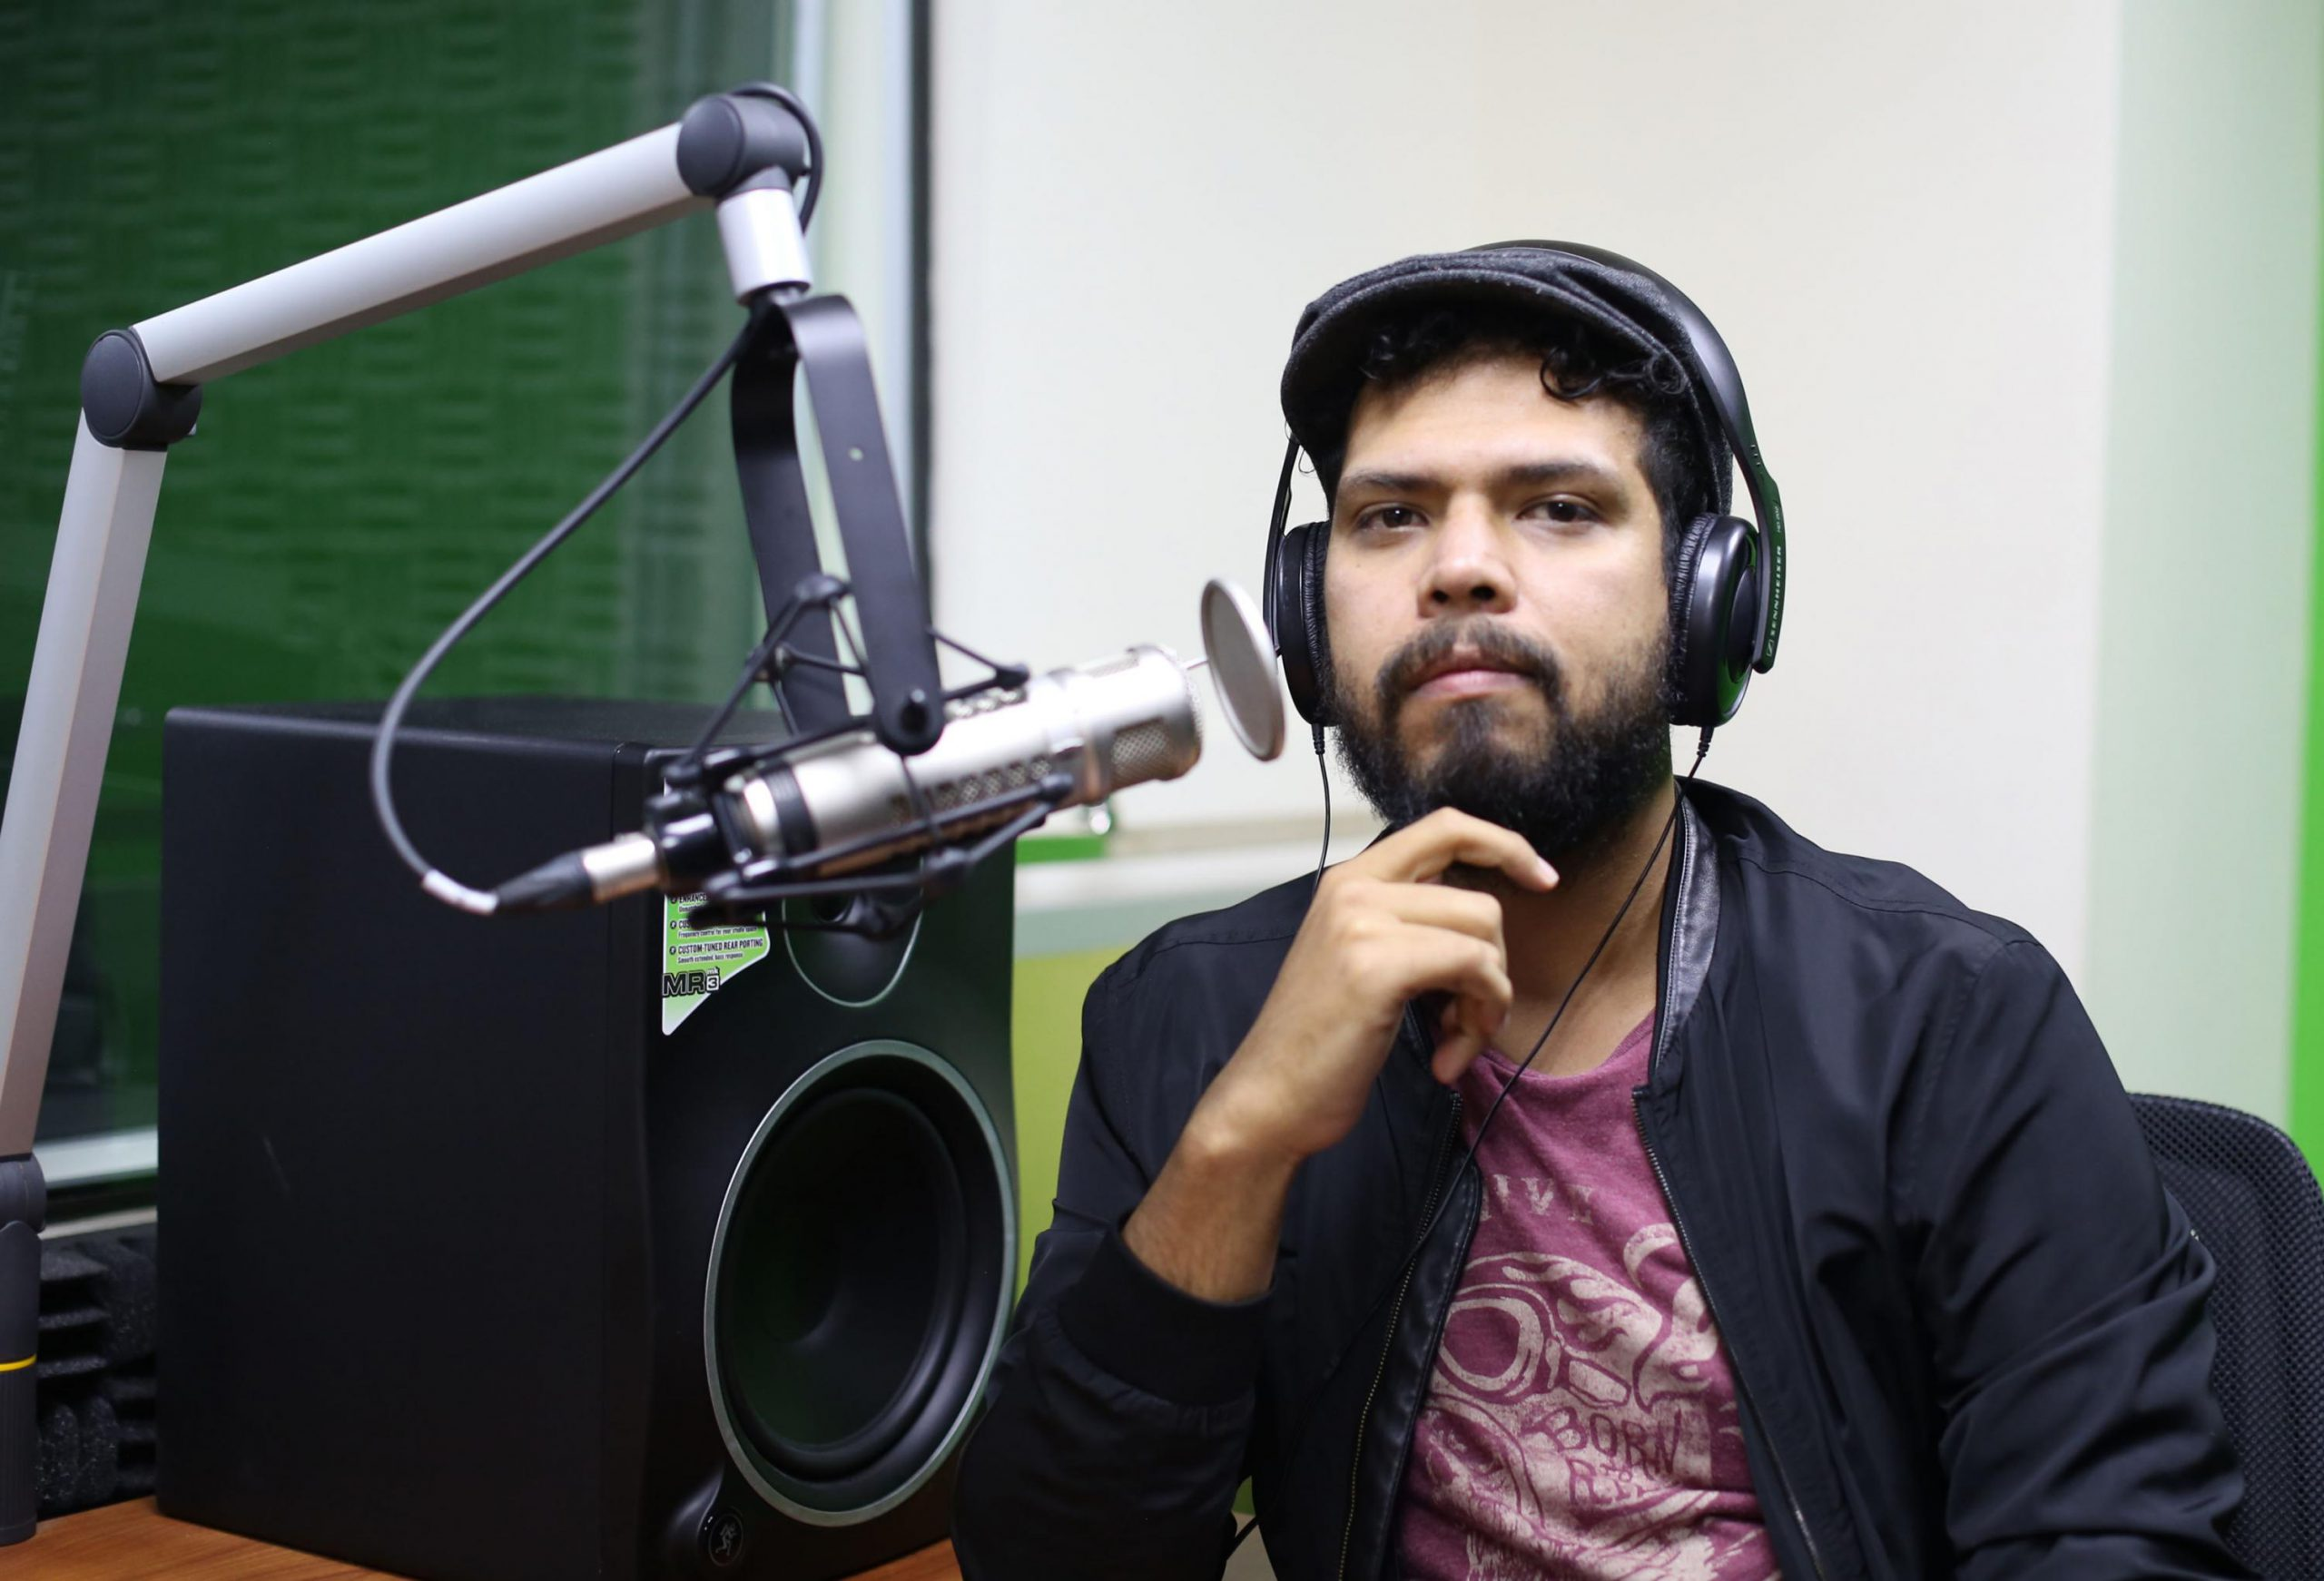 Iván Serrano Jauregui